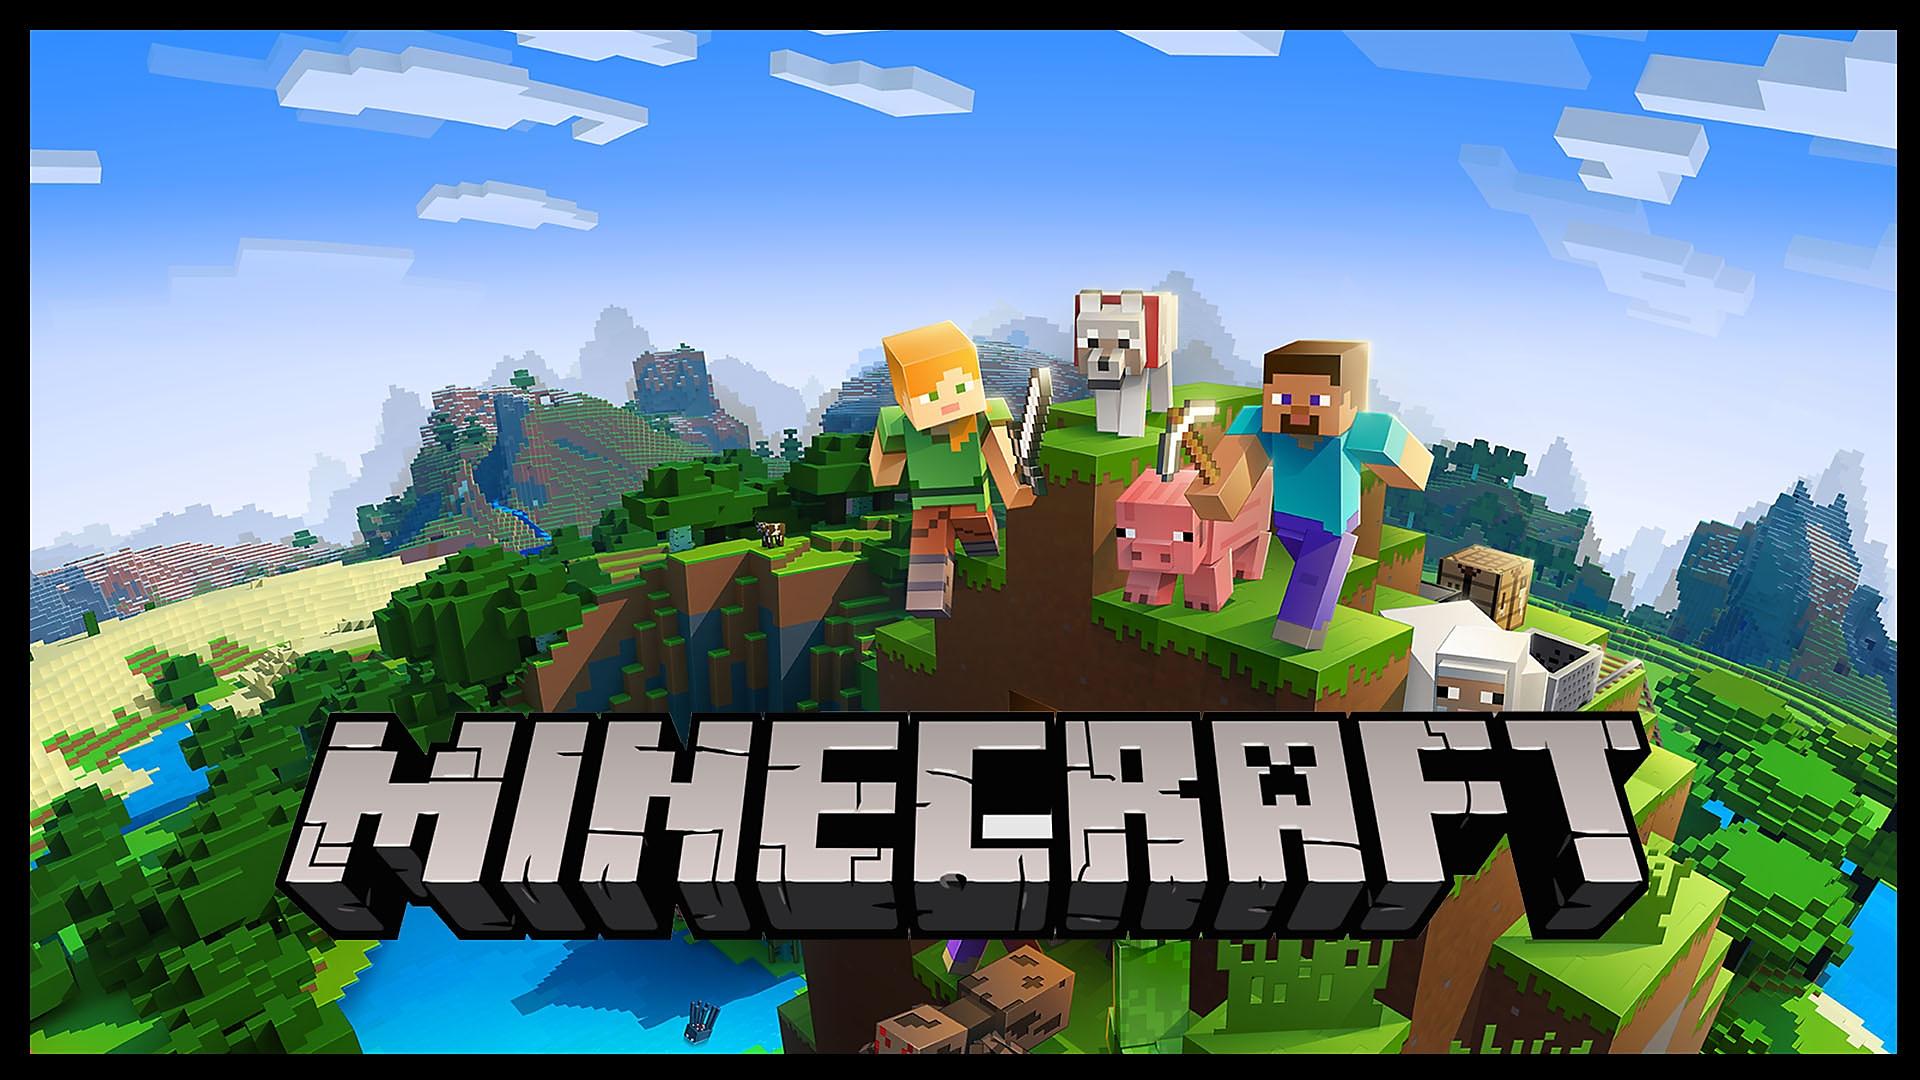 Tráiler de revelación de Minecraft PS4